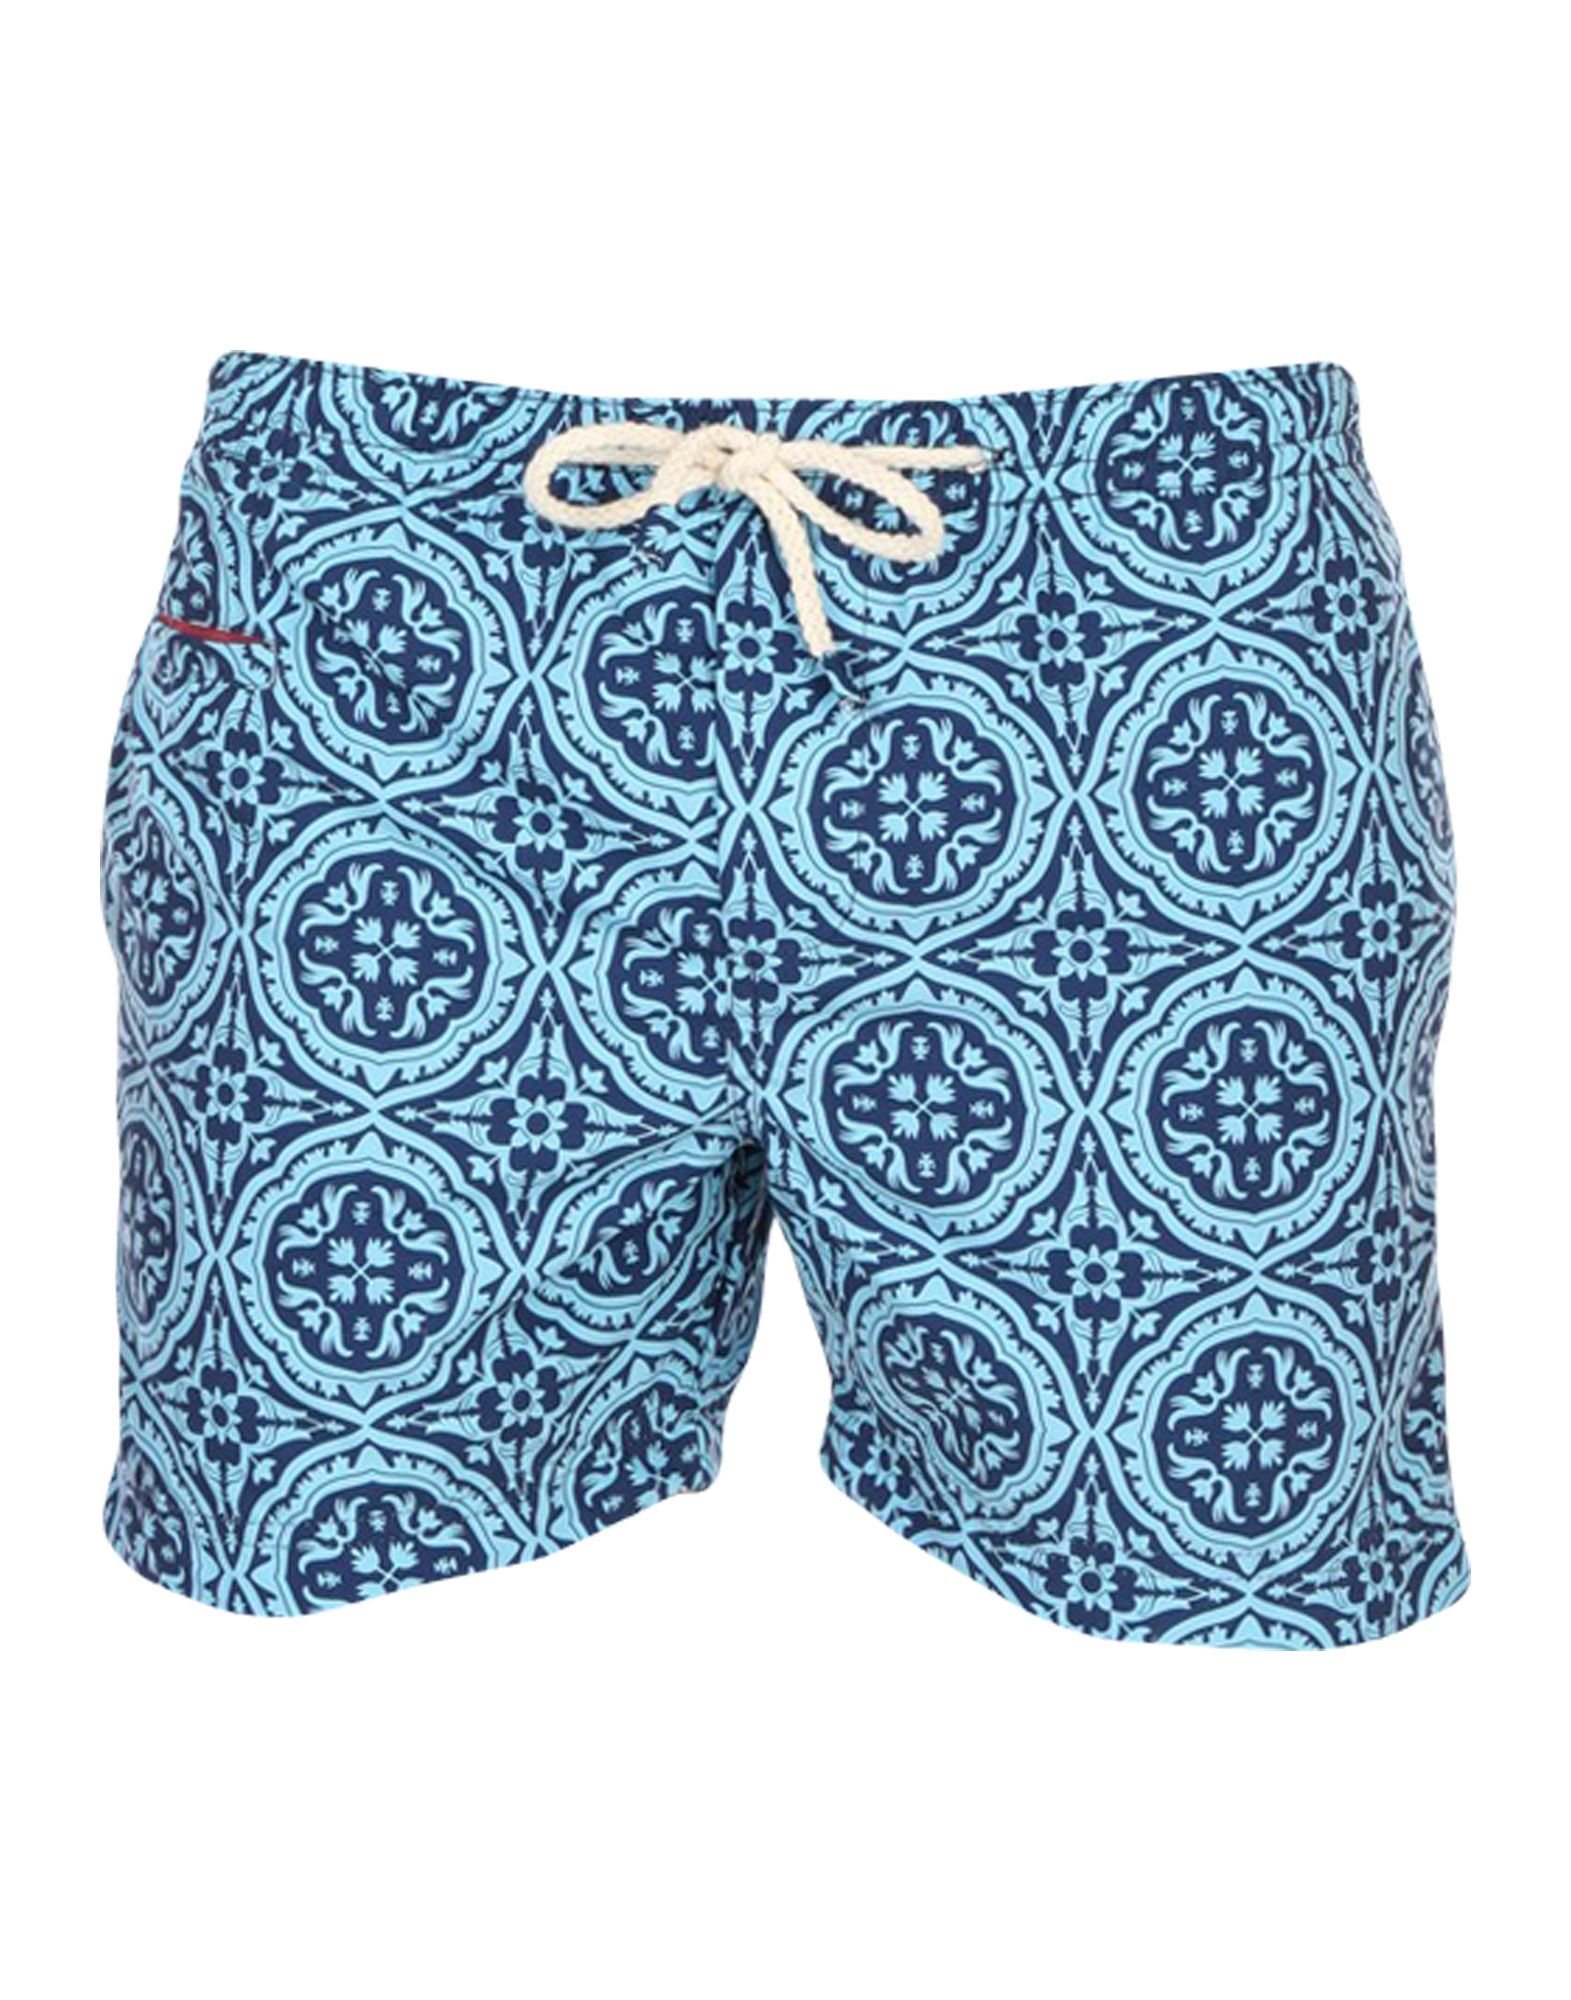 PENINSULA Swimwear Шорты для плавания